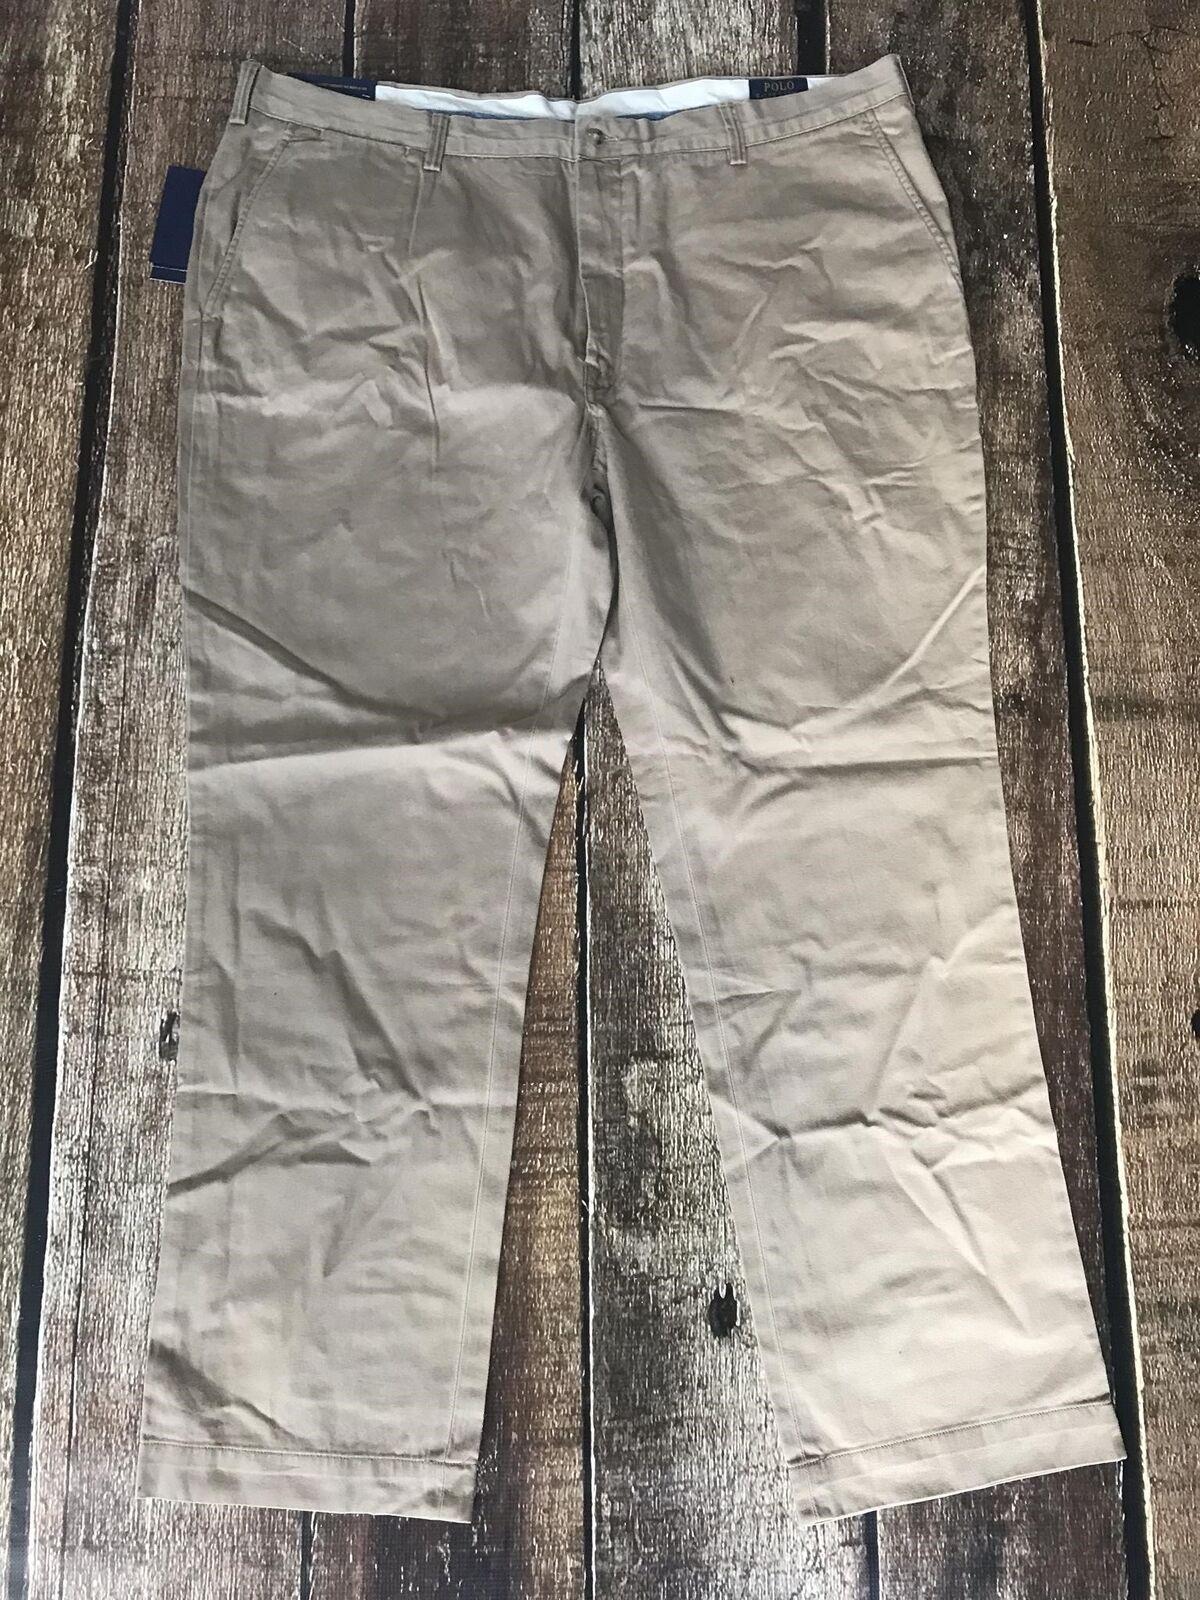 Polo Ralph Lauren Stretch Classic Fit Boating Khaki Mens 32x32 New